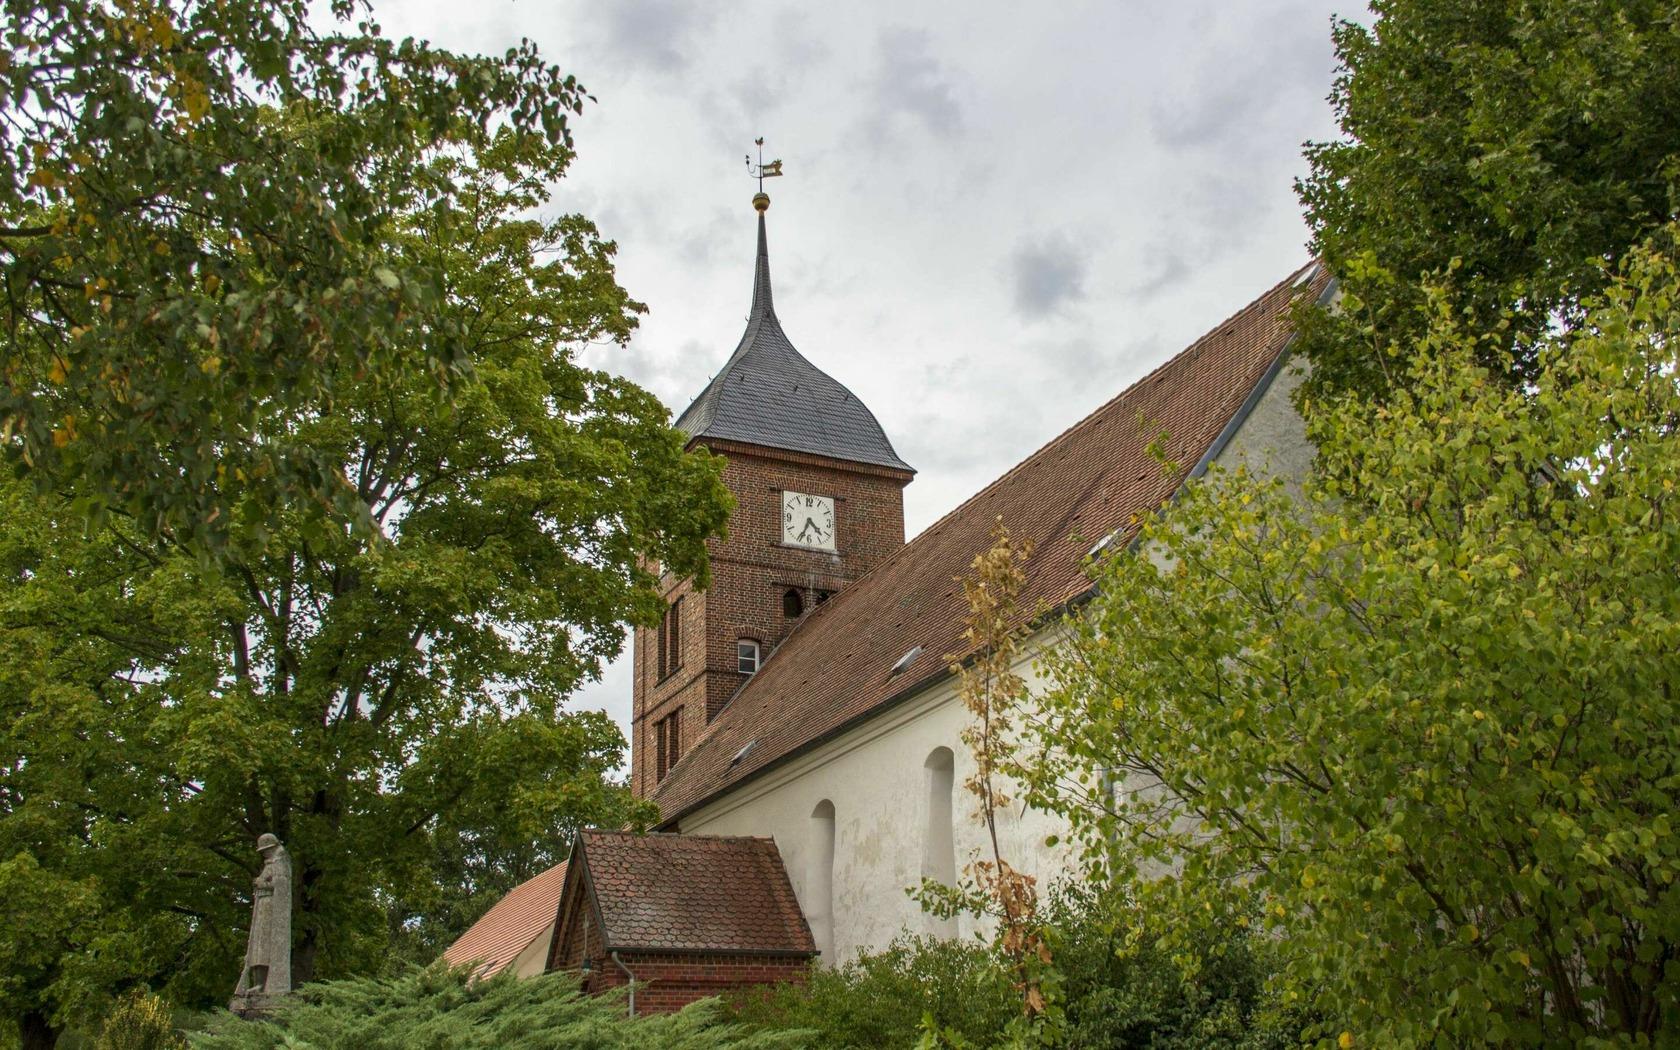 Kirche Atterwasch, Foto: TMB-Fotoarchiv/ScottyScout